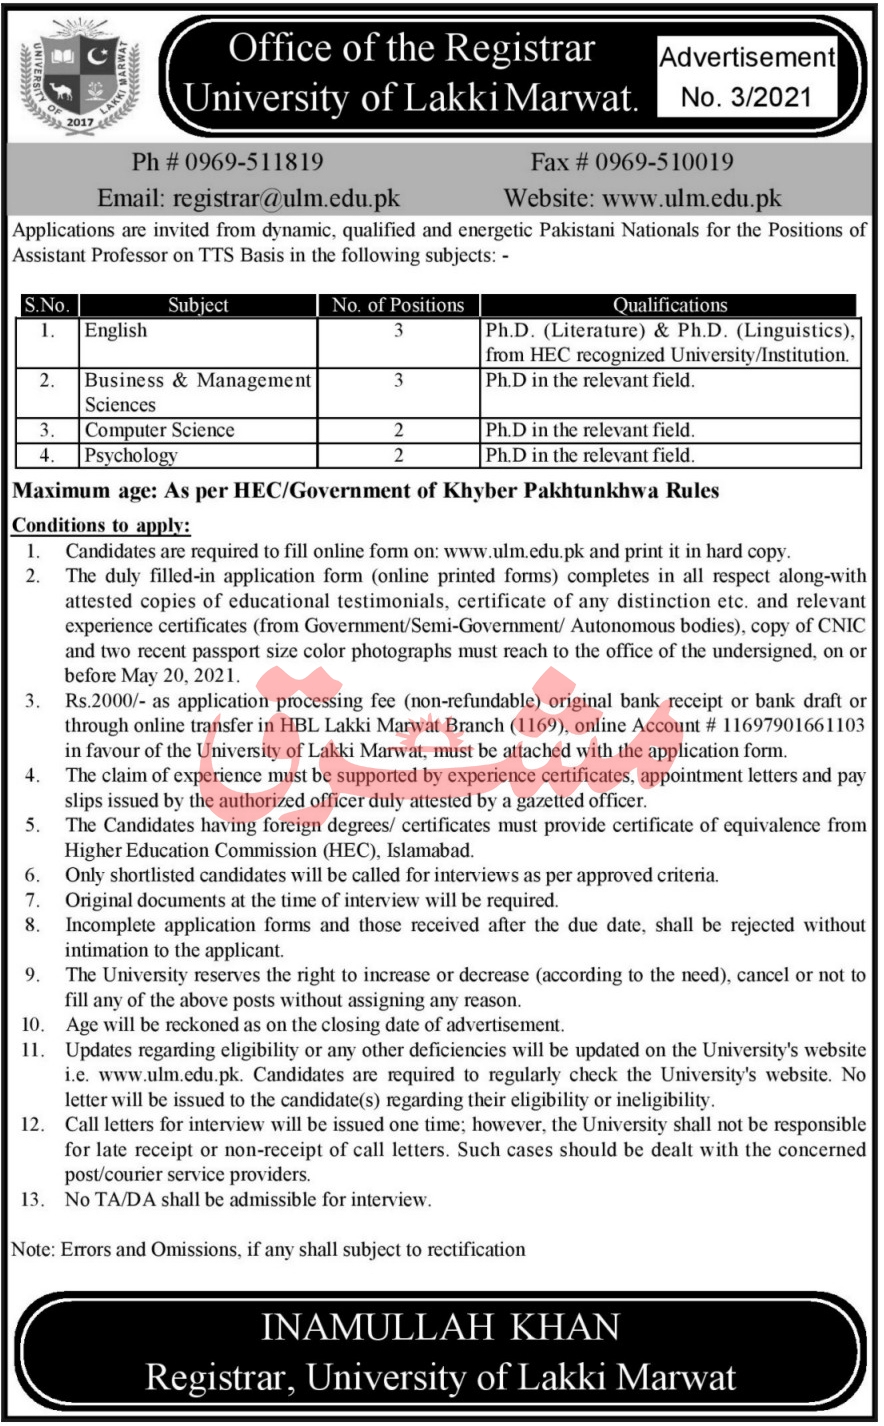 University of Laki Marwat jobs 2021 latest advertisement